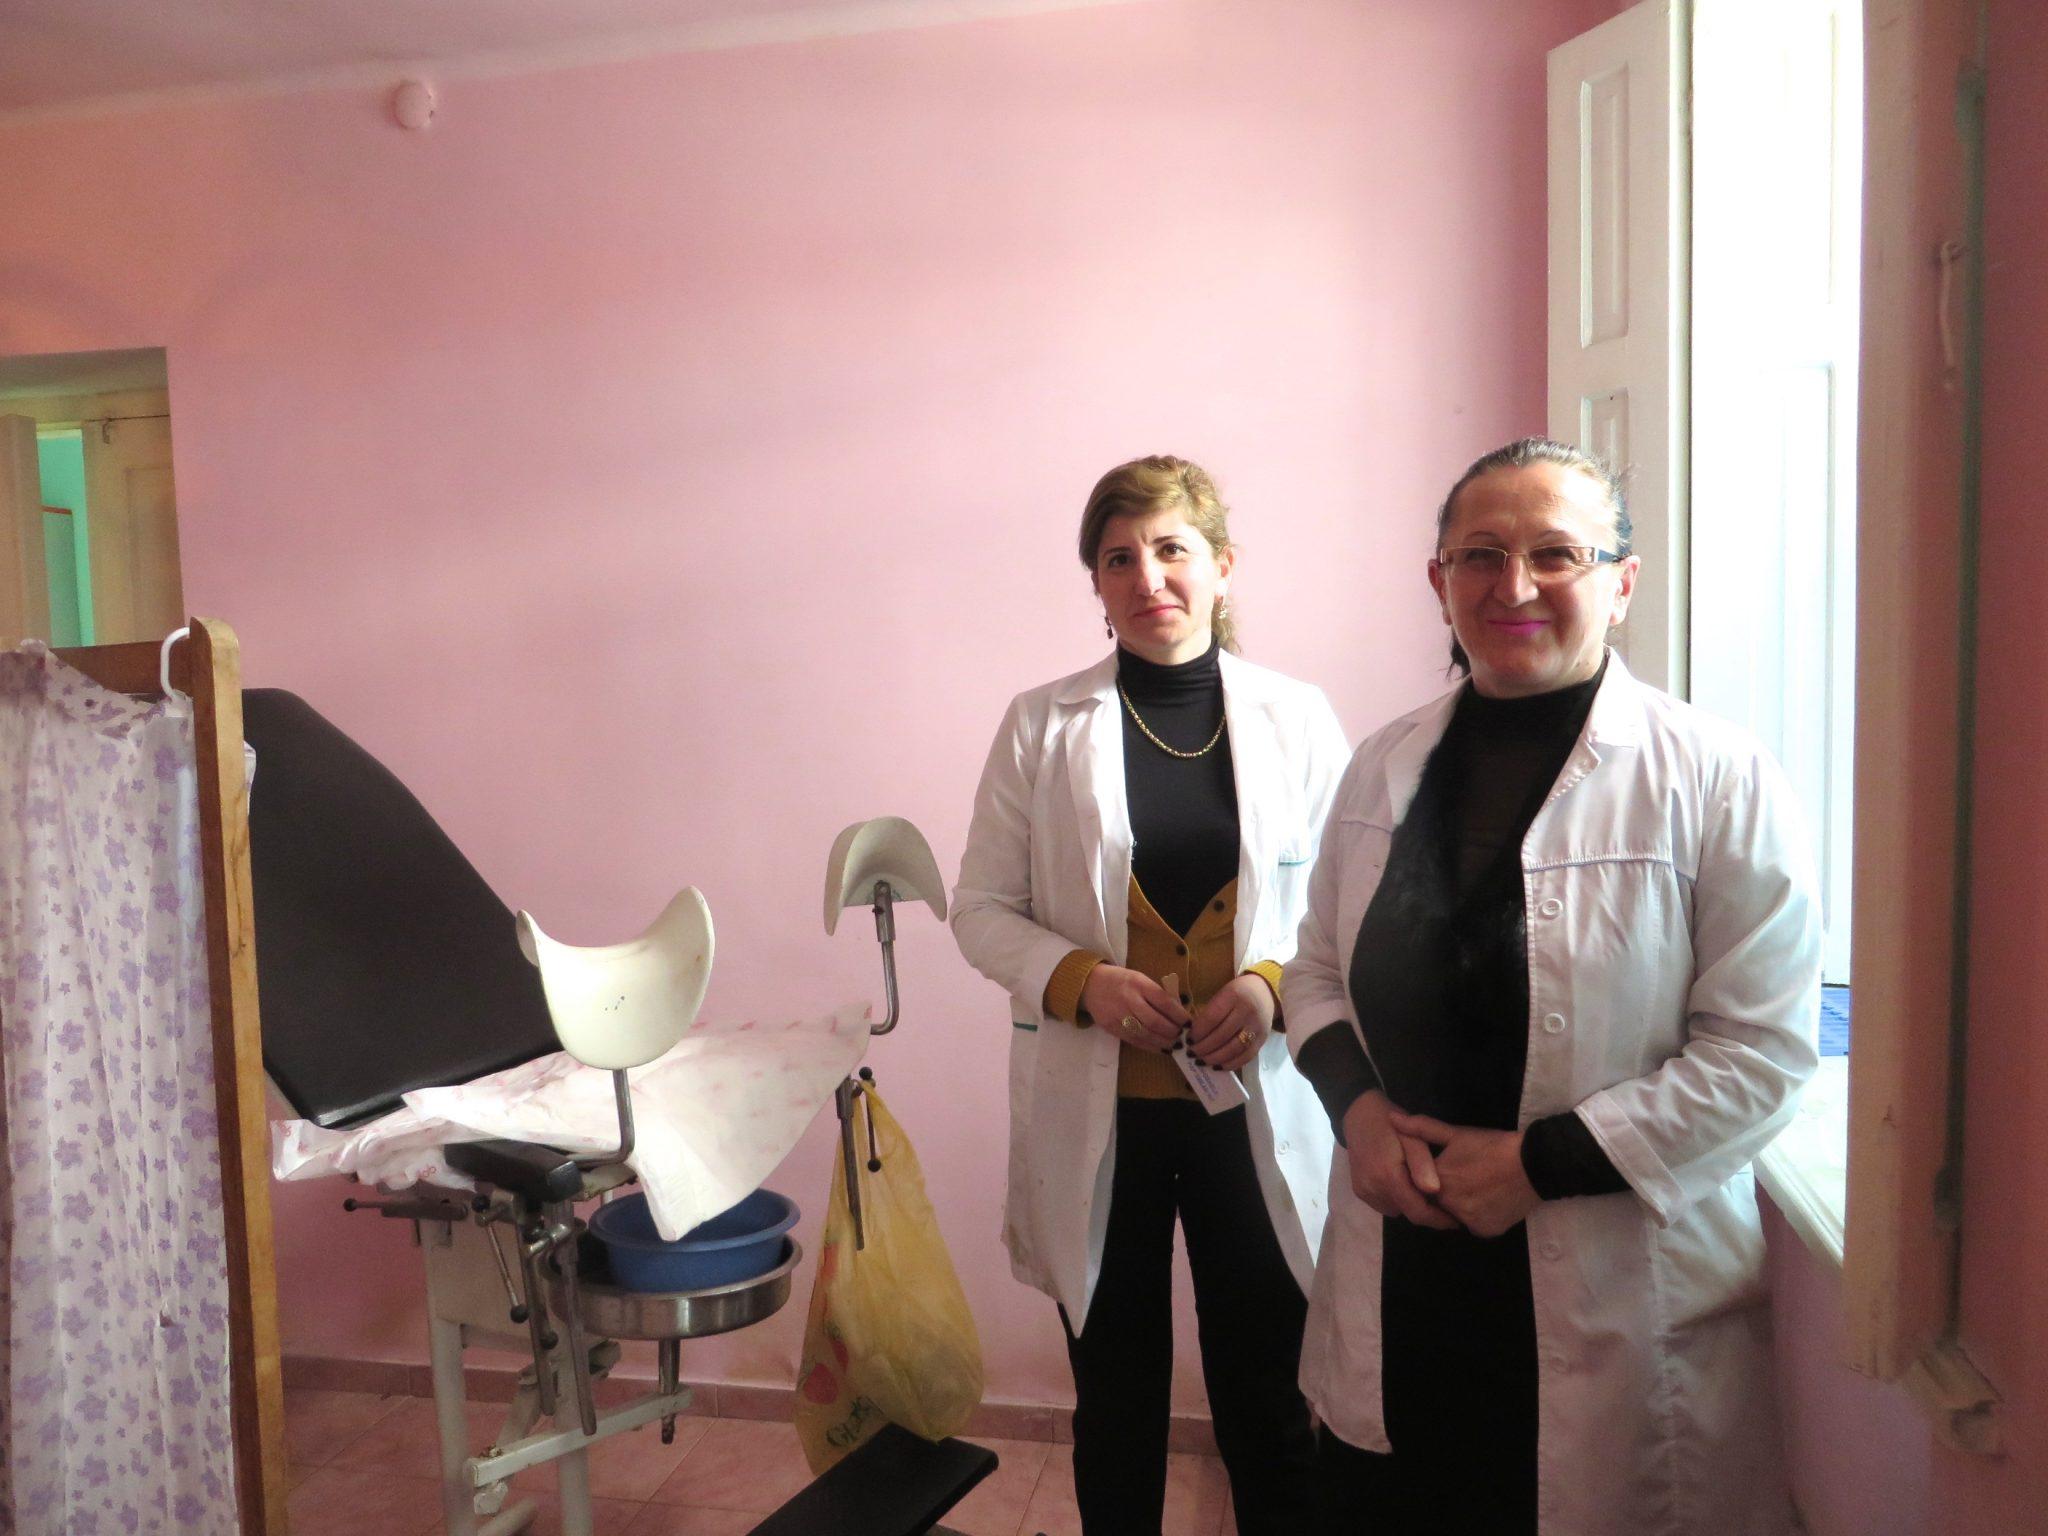 Every year, nurse Maia Mamulashvili and gynaecologist Manana Vengrjhanovich of Georgia's Democratic Women's Organization provide hundreds of women and girls with free screenings and care. Photo: Emma Söderström / Kvinna till Kvinna.